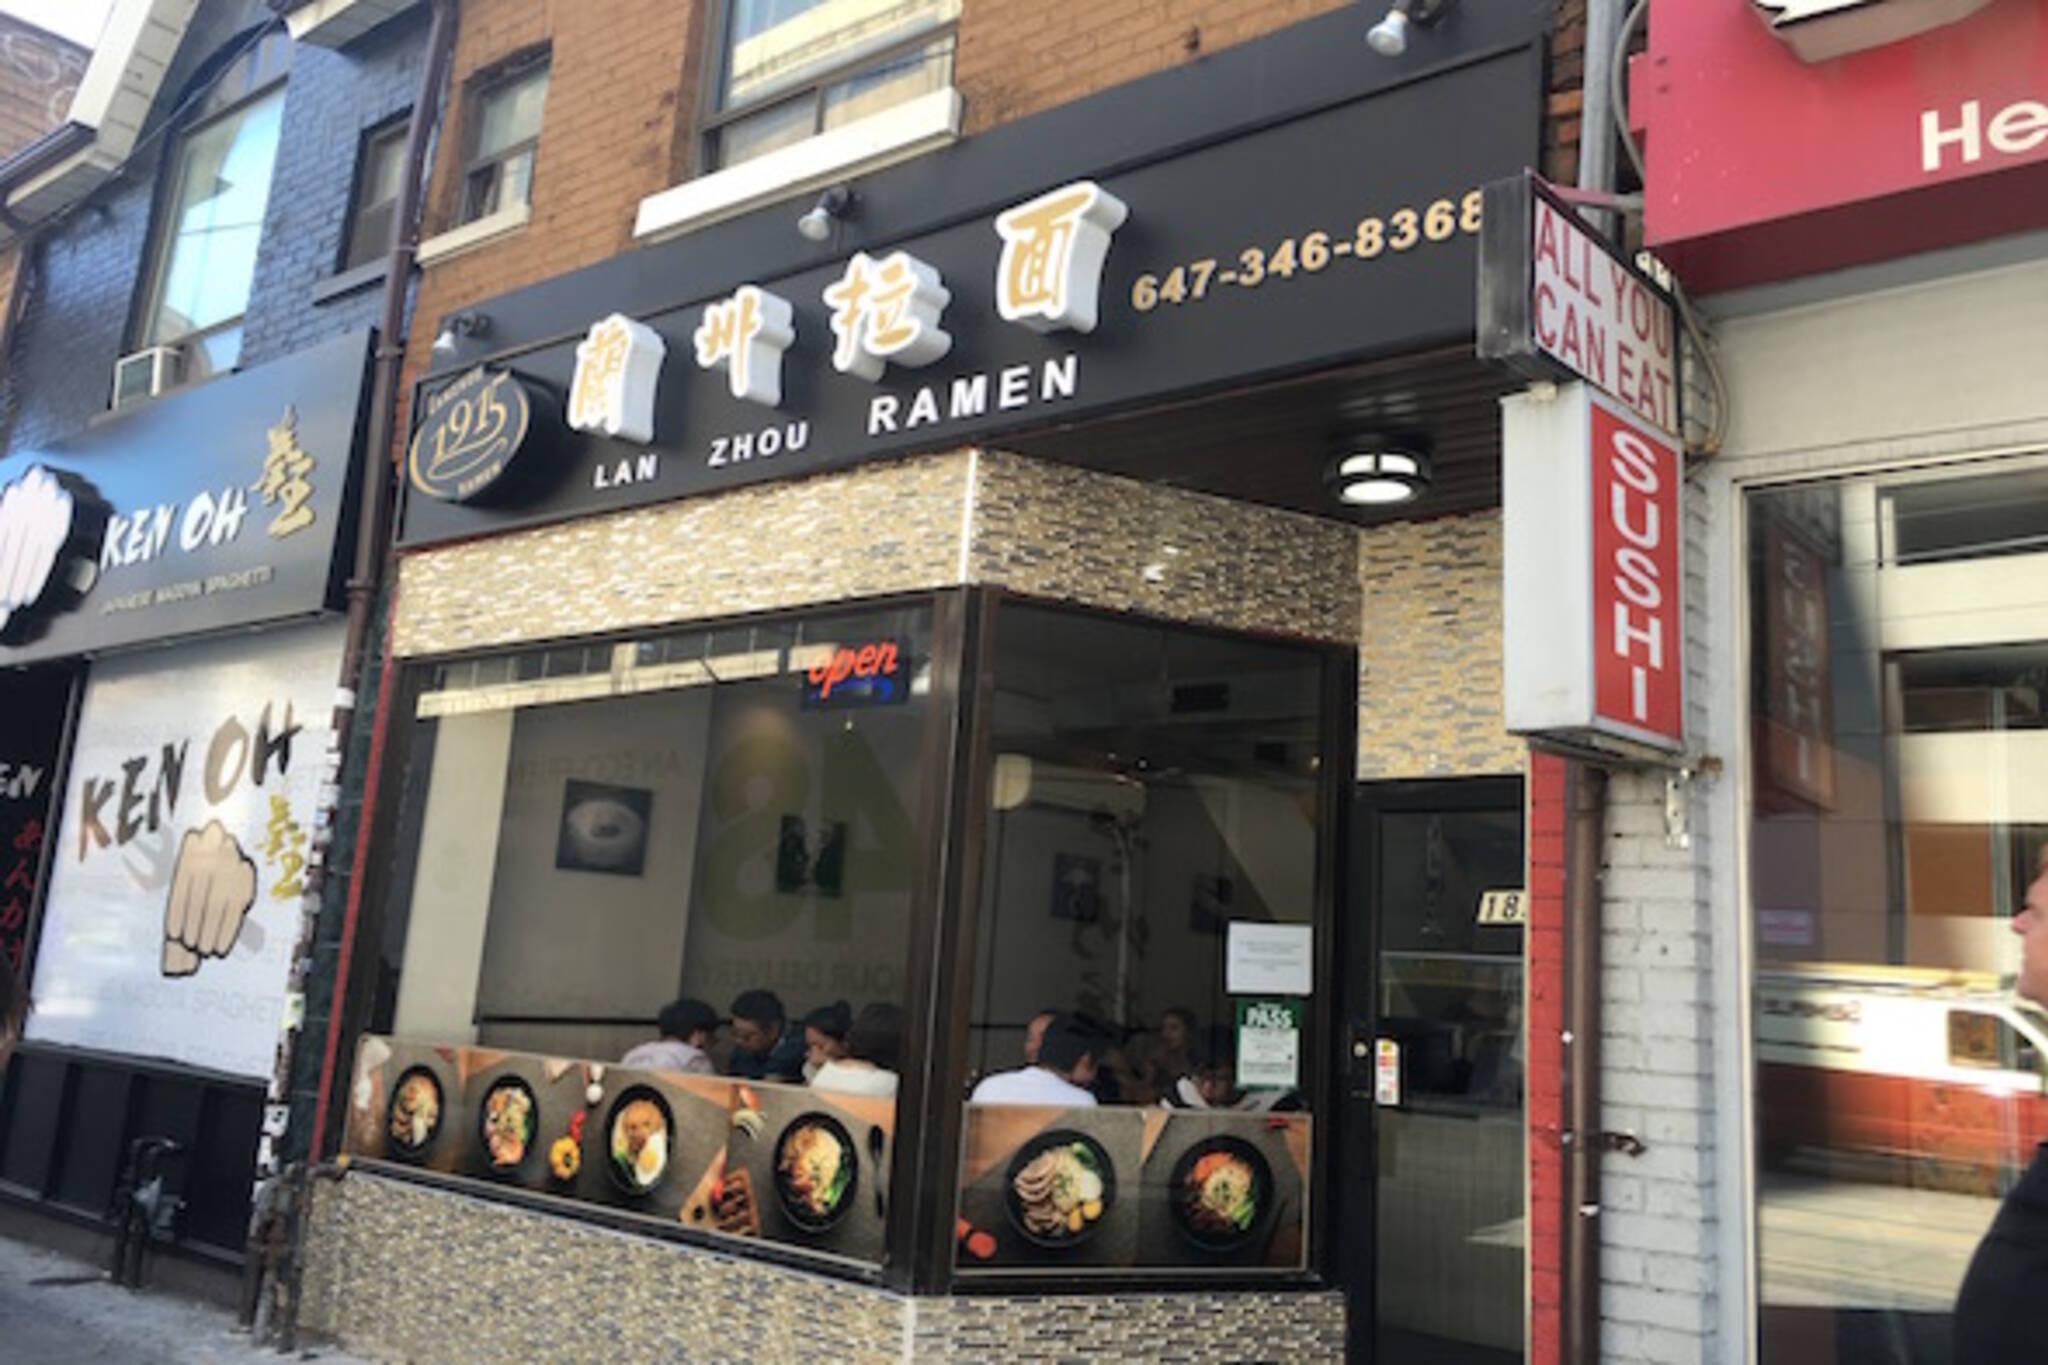 Lan Zhou Ramen Toronto